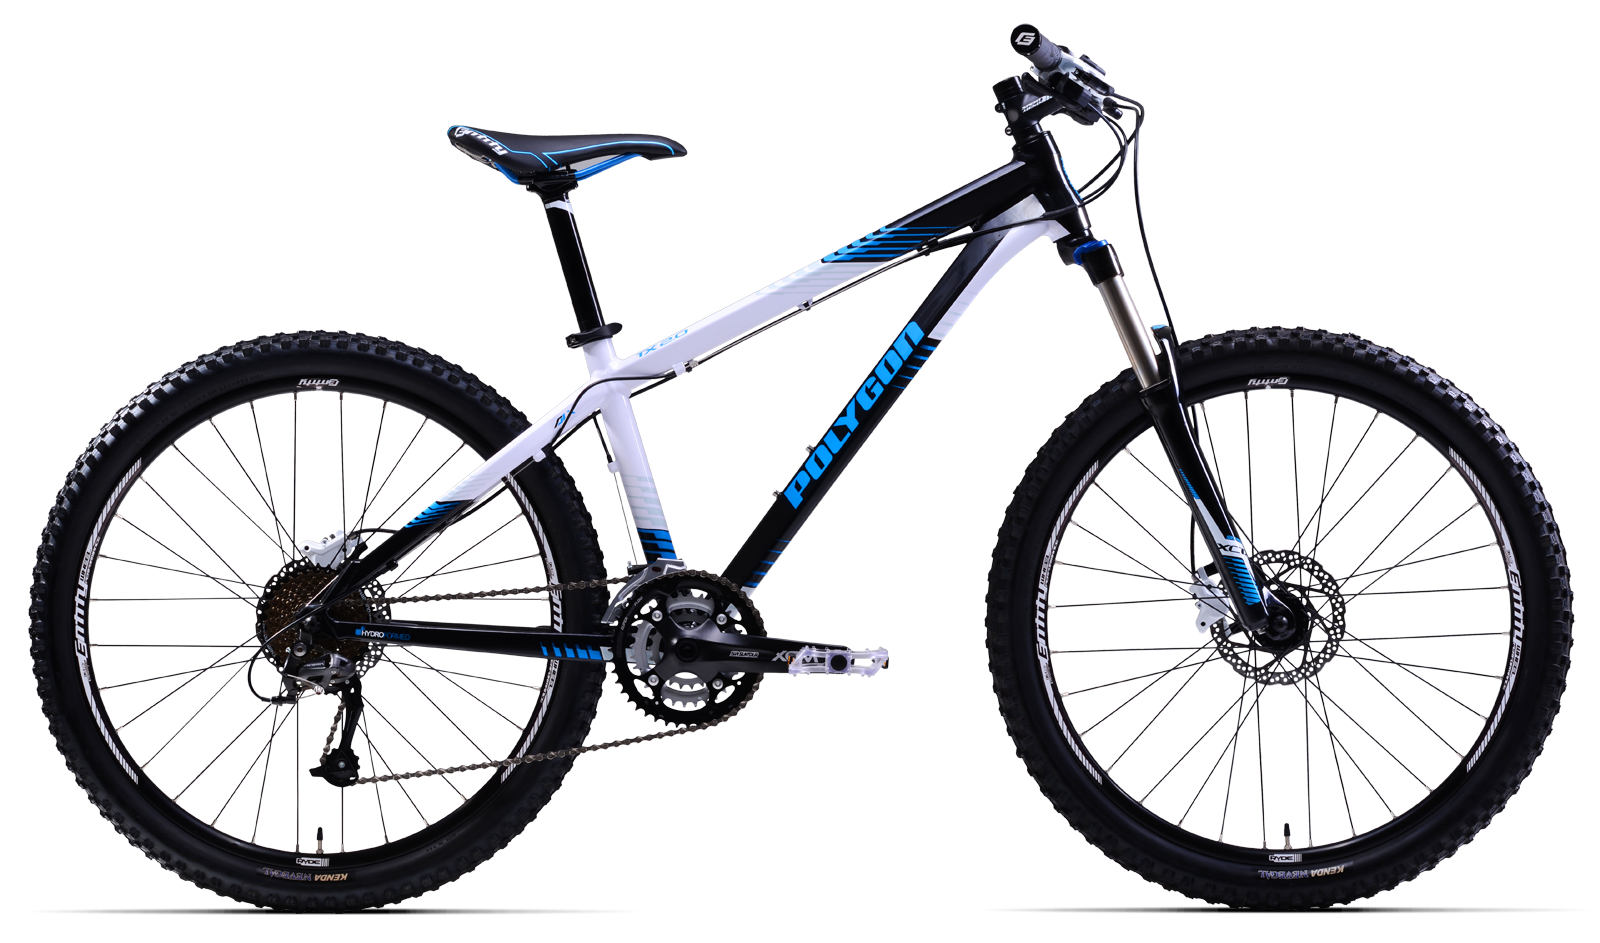 Terbaru 43+ Harga Sepeda Gunung Genio Porvoo Xc 07